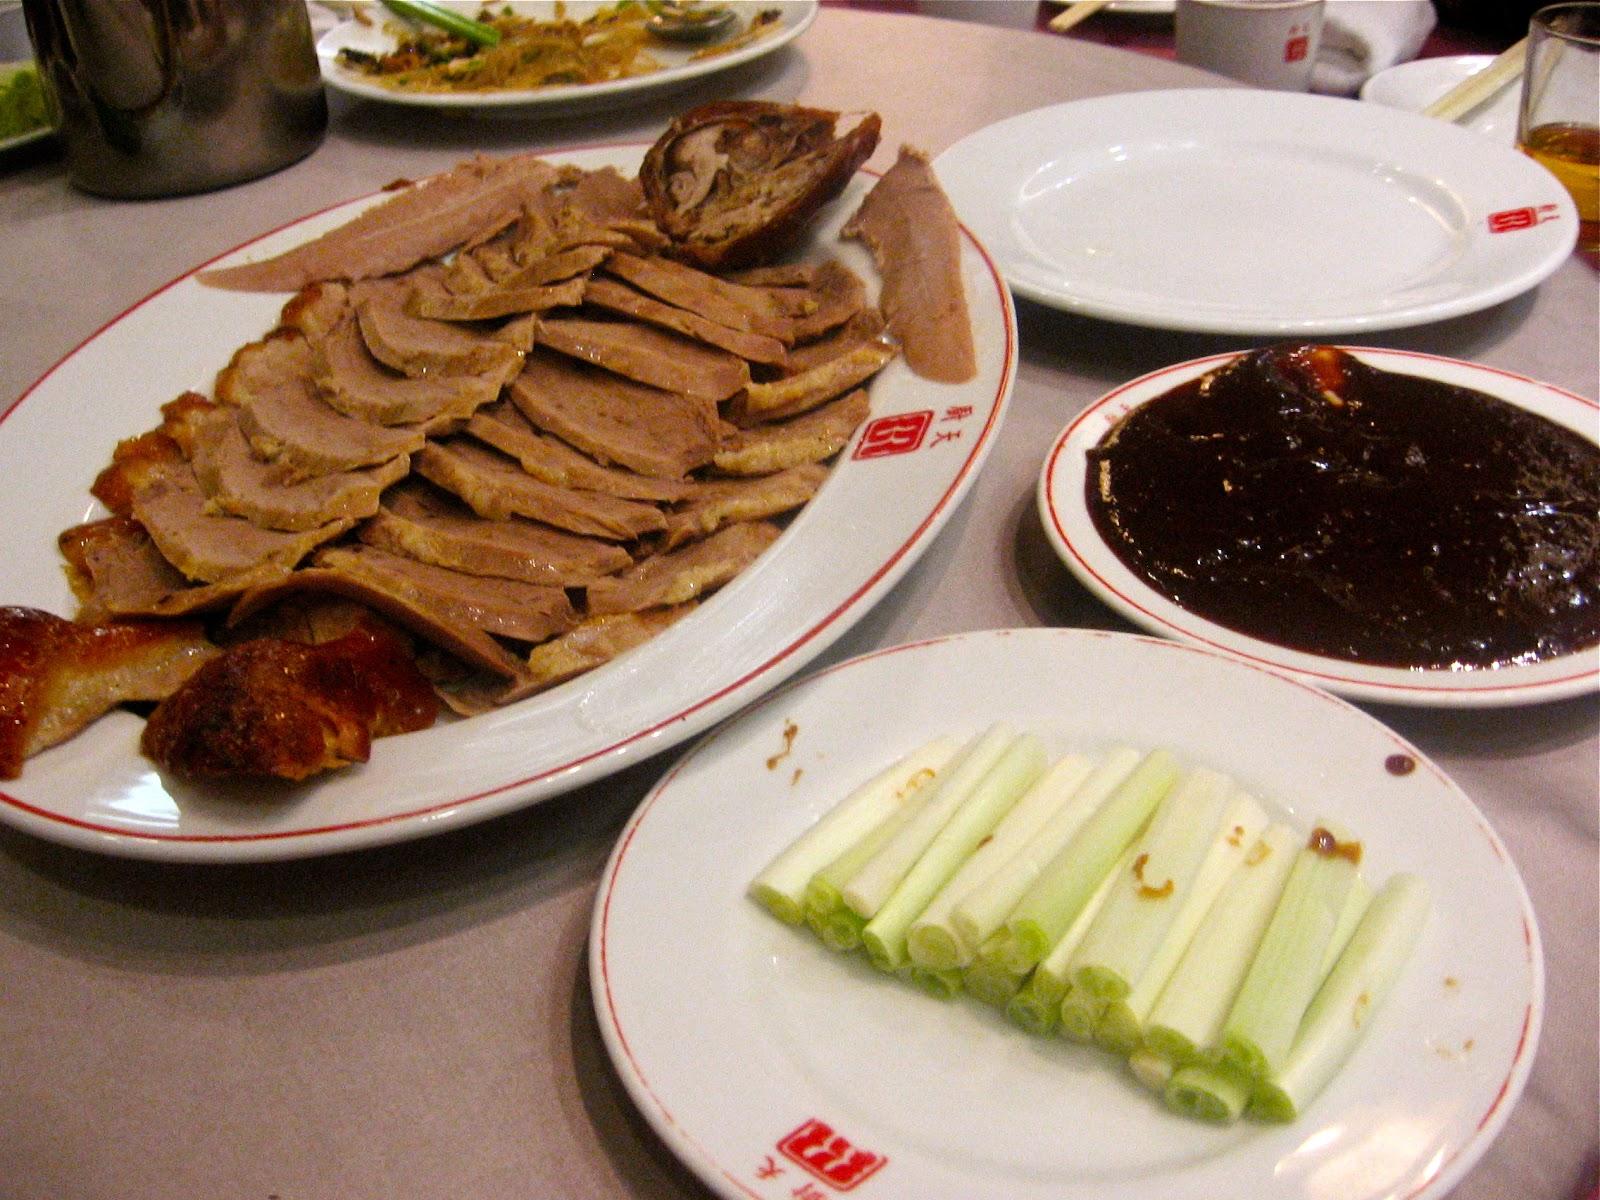 lao ren cha 罟窶竅网篌篌罟竚筝 beijing duck in taipei